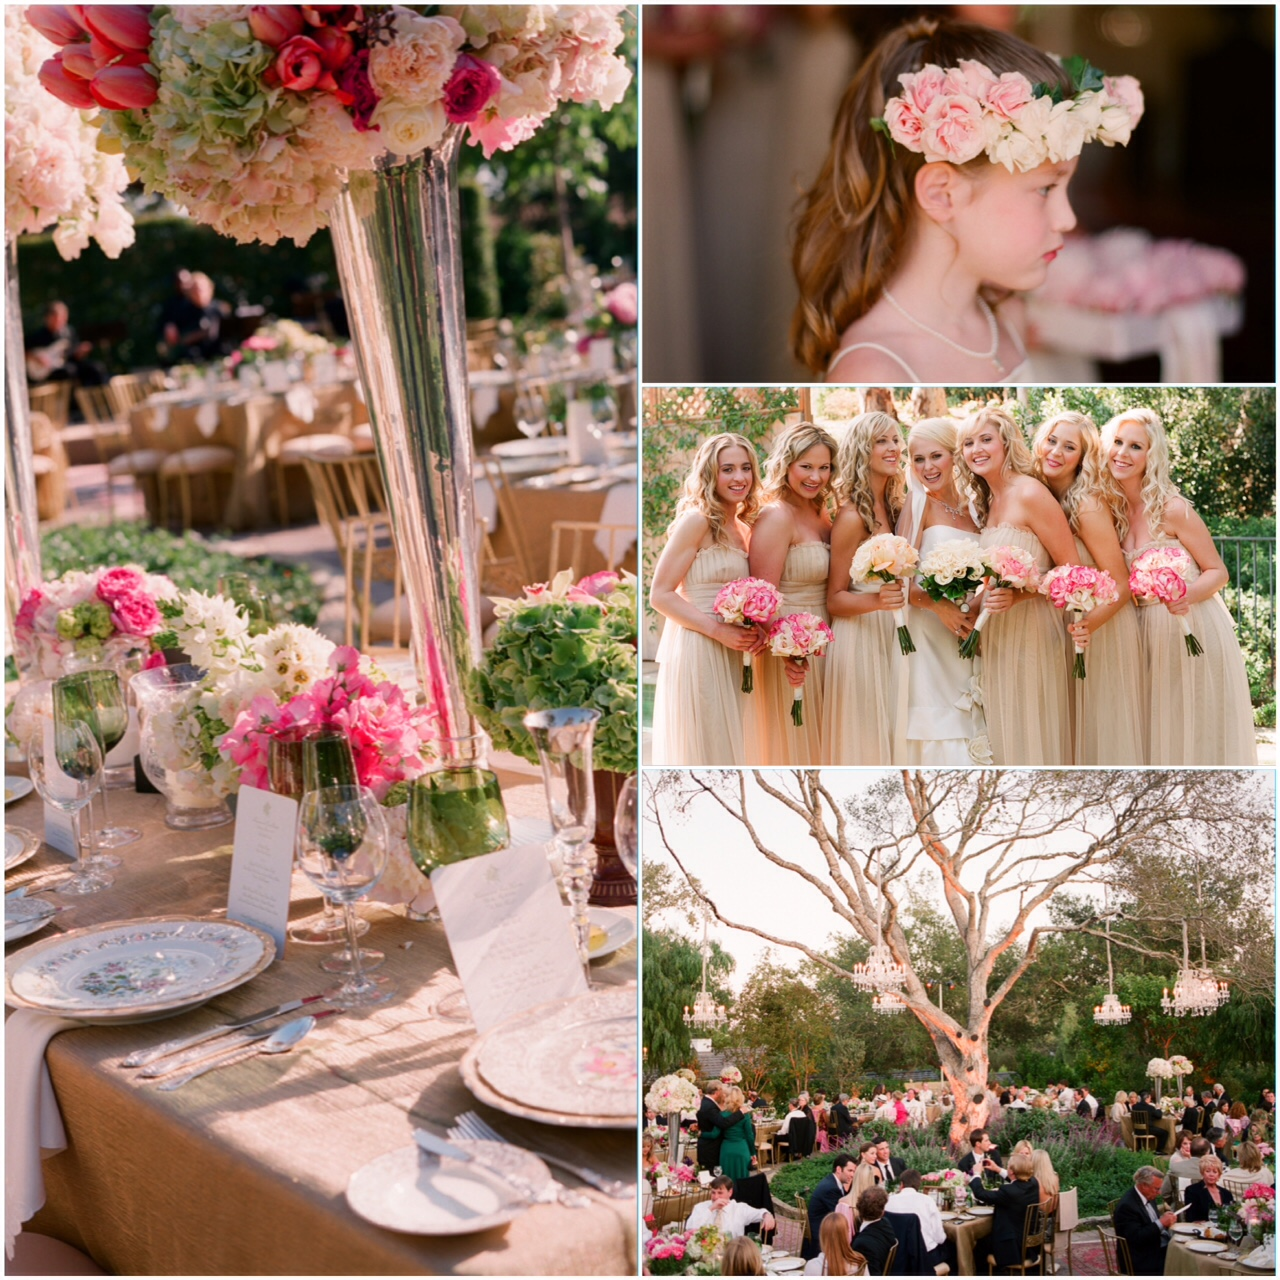 Boho wedding ideas for nature inspired celebrations inside weddings boho wedding ideas for celebrations inspired by nature junglespirit Choice Image